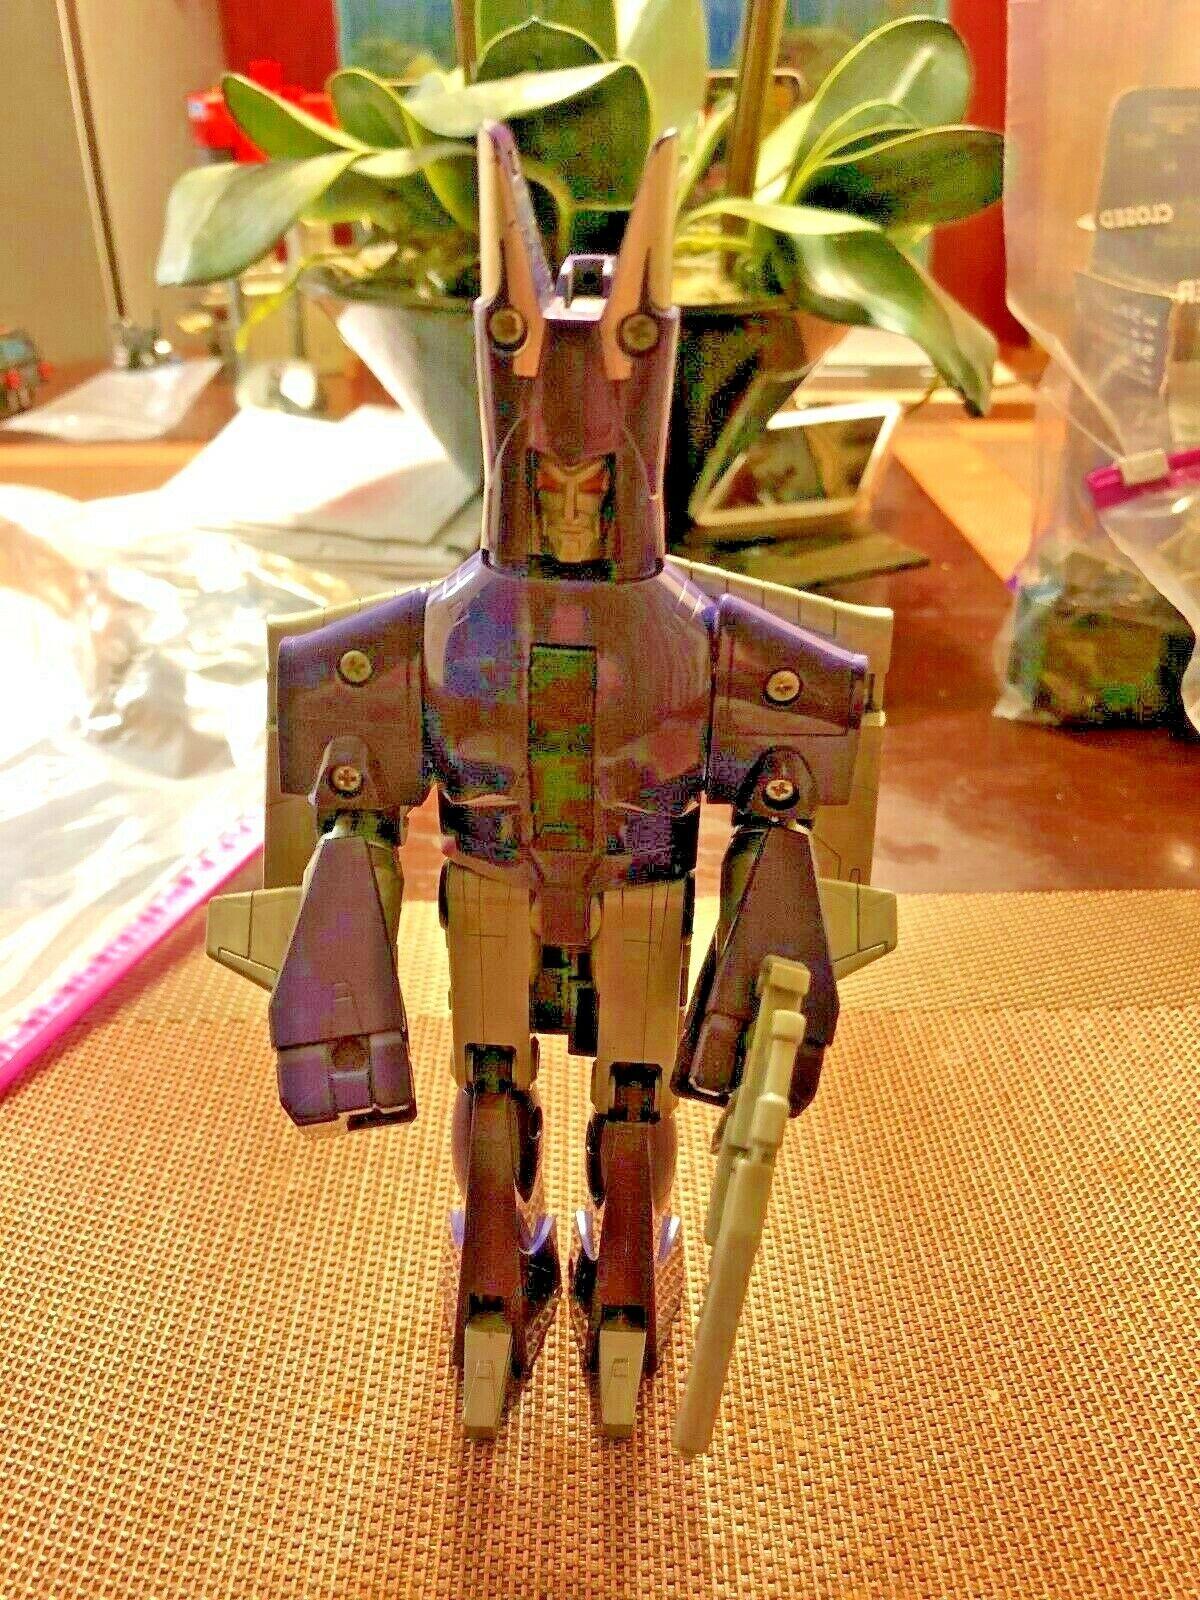 Transformers Original G1 1985 Decepticon Jet Cyclonus Completa    LQQK